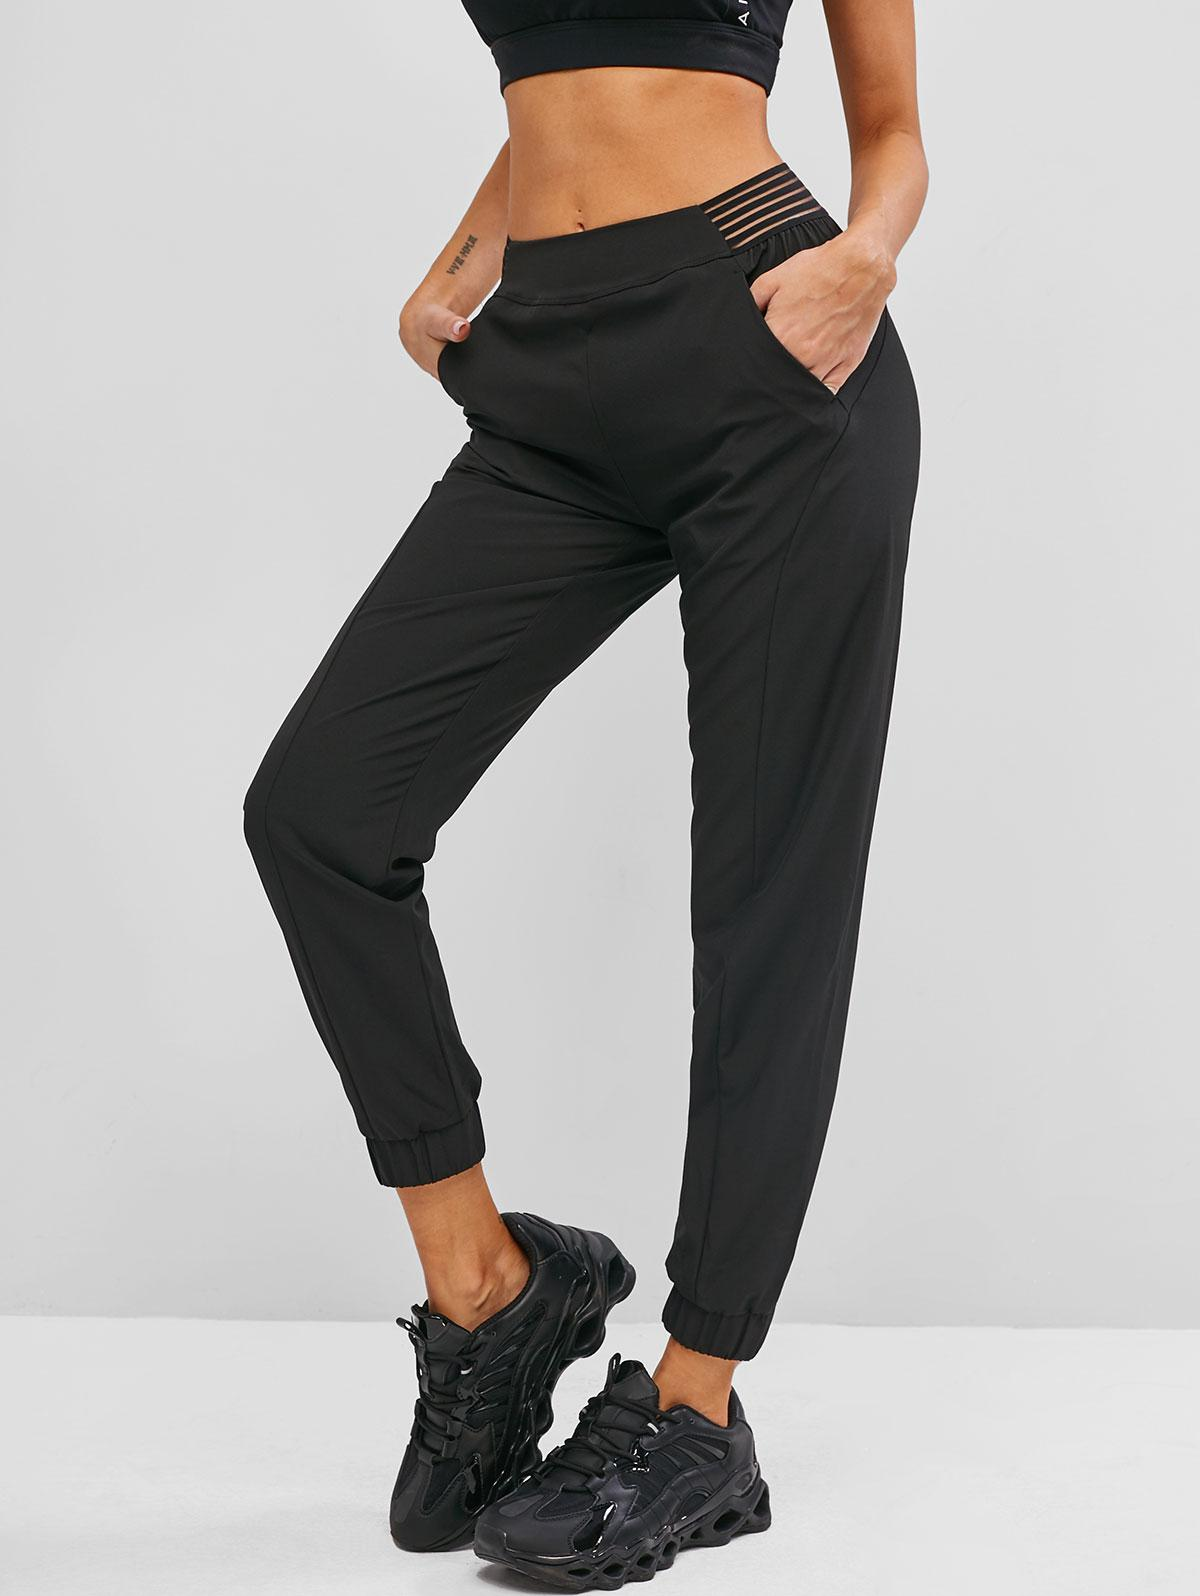 Pockets High Waisted Shadow Stripes Jogger Pants